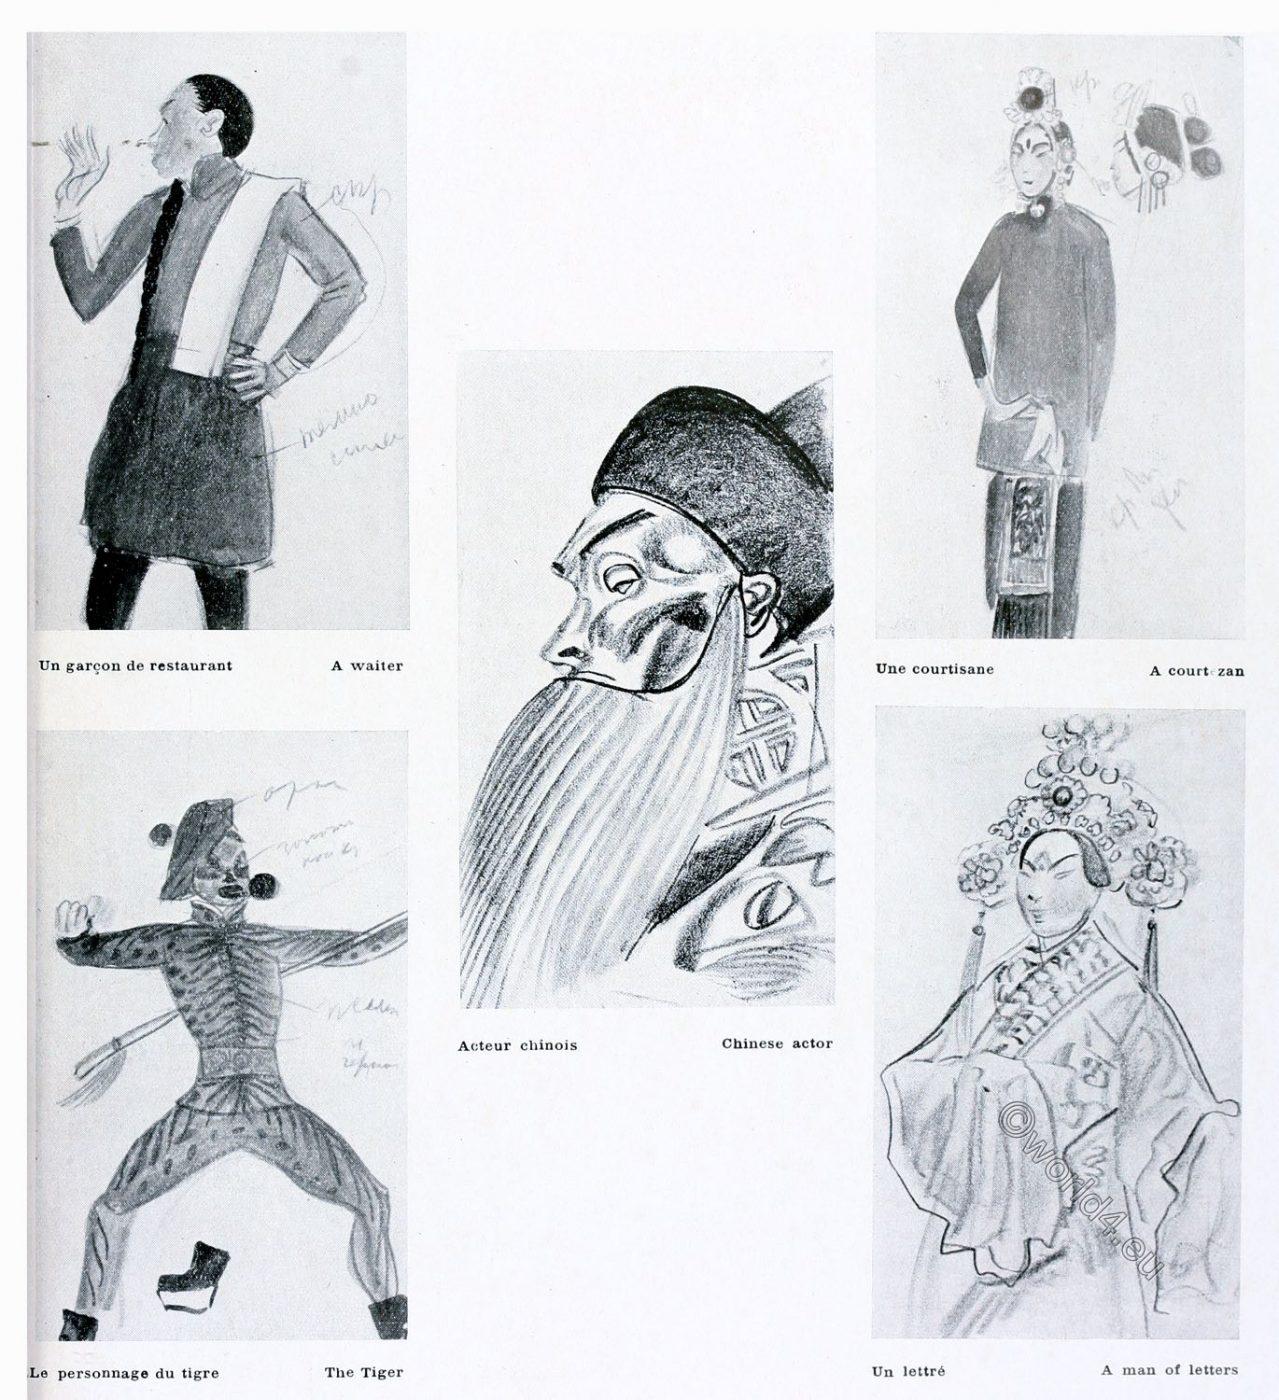 Actors, Chinese, theatre, Jakowlew, China, Opera,